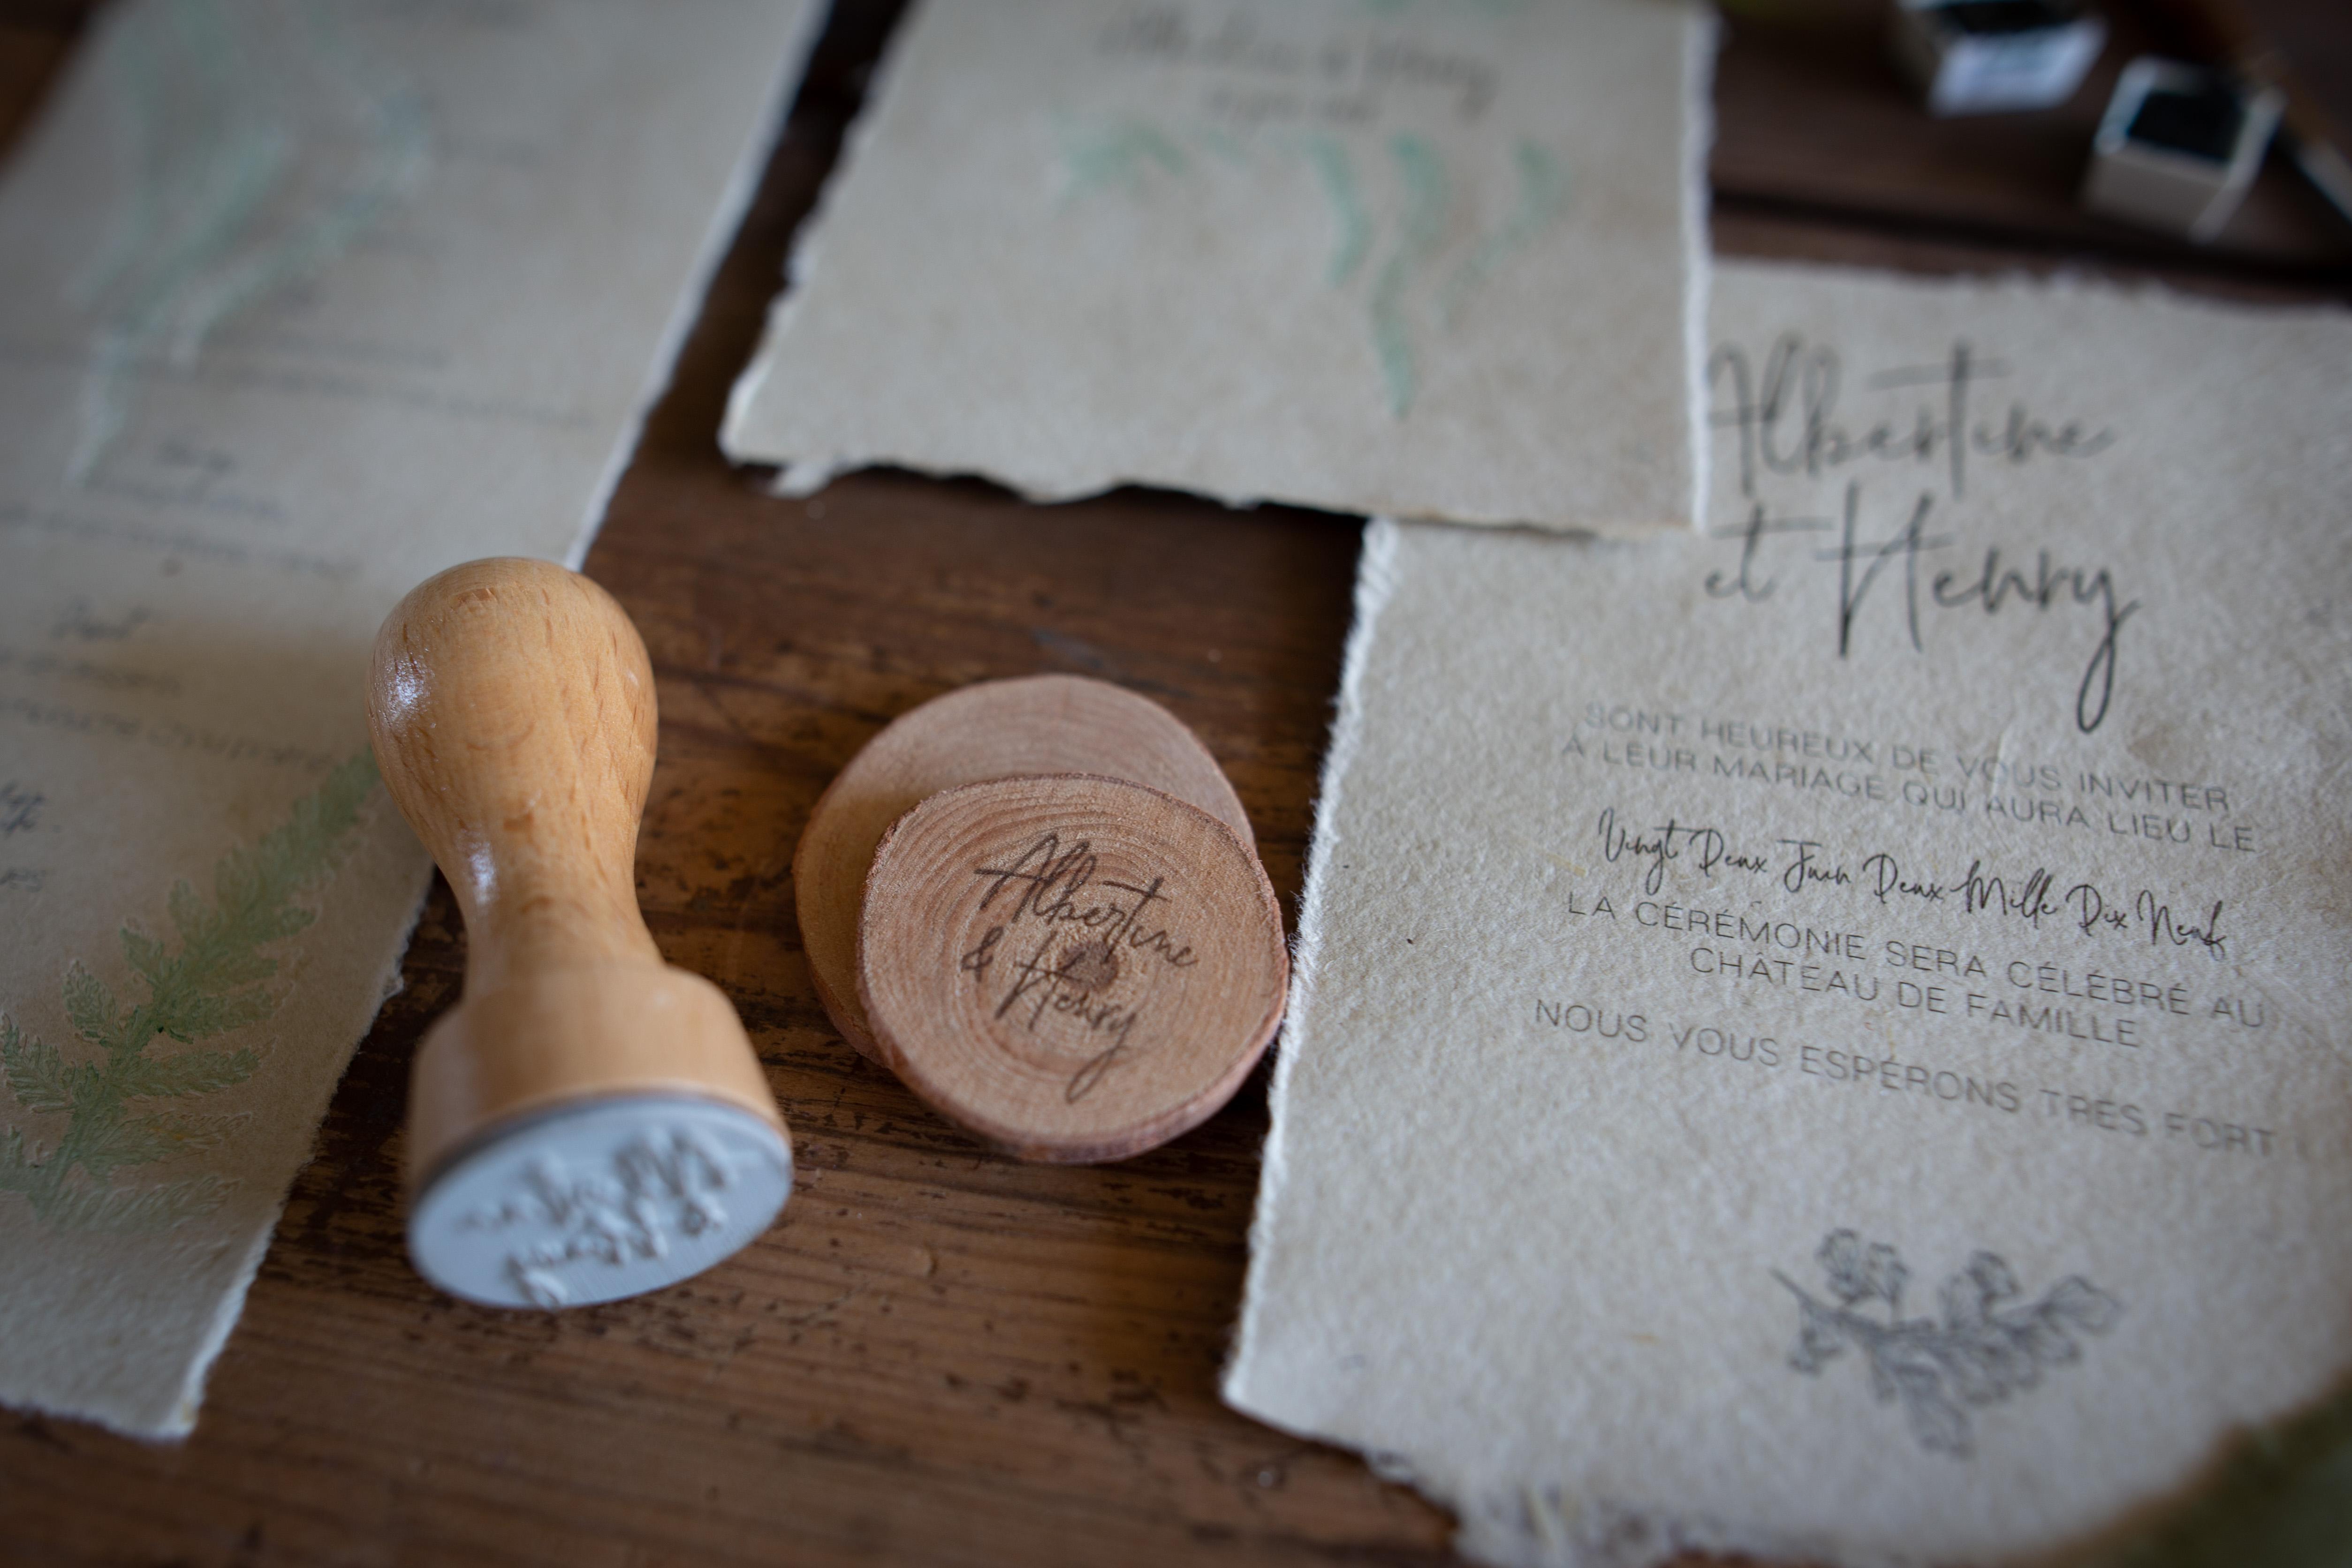 Collection fougère, faire-part, save the date, invitation, tampon, spiritus naturae-3